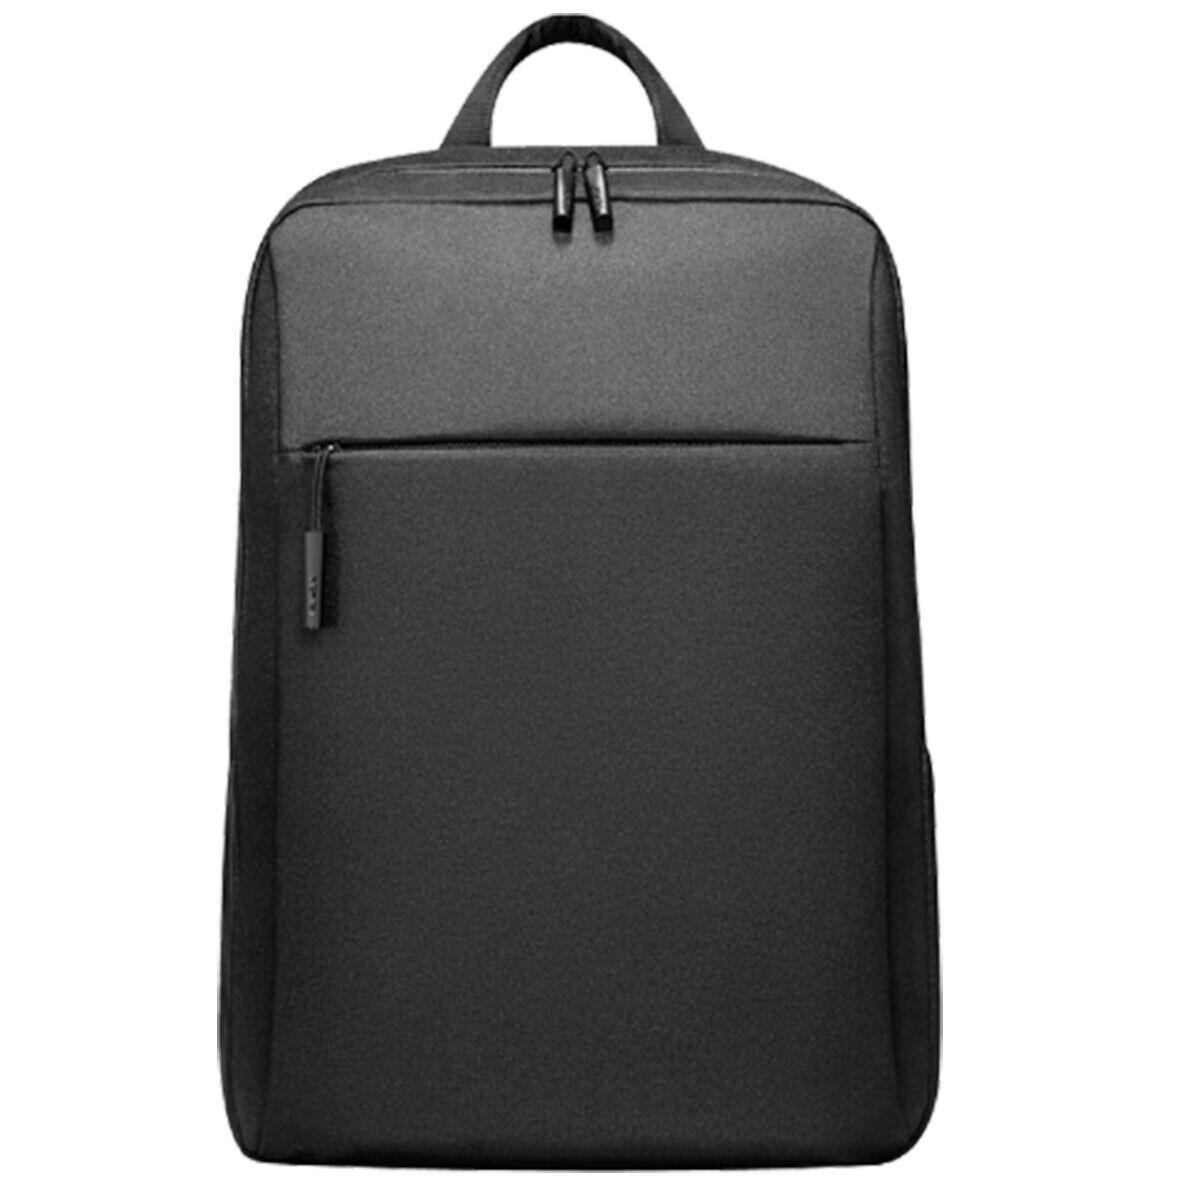 "Original Huawei Honor Backpack 16.1"" Matebook X Pro Macbook"